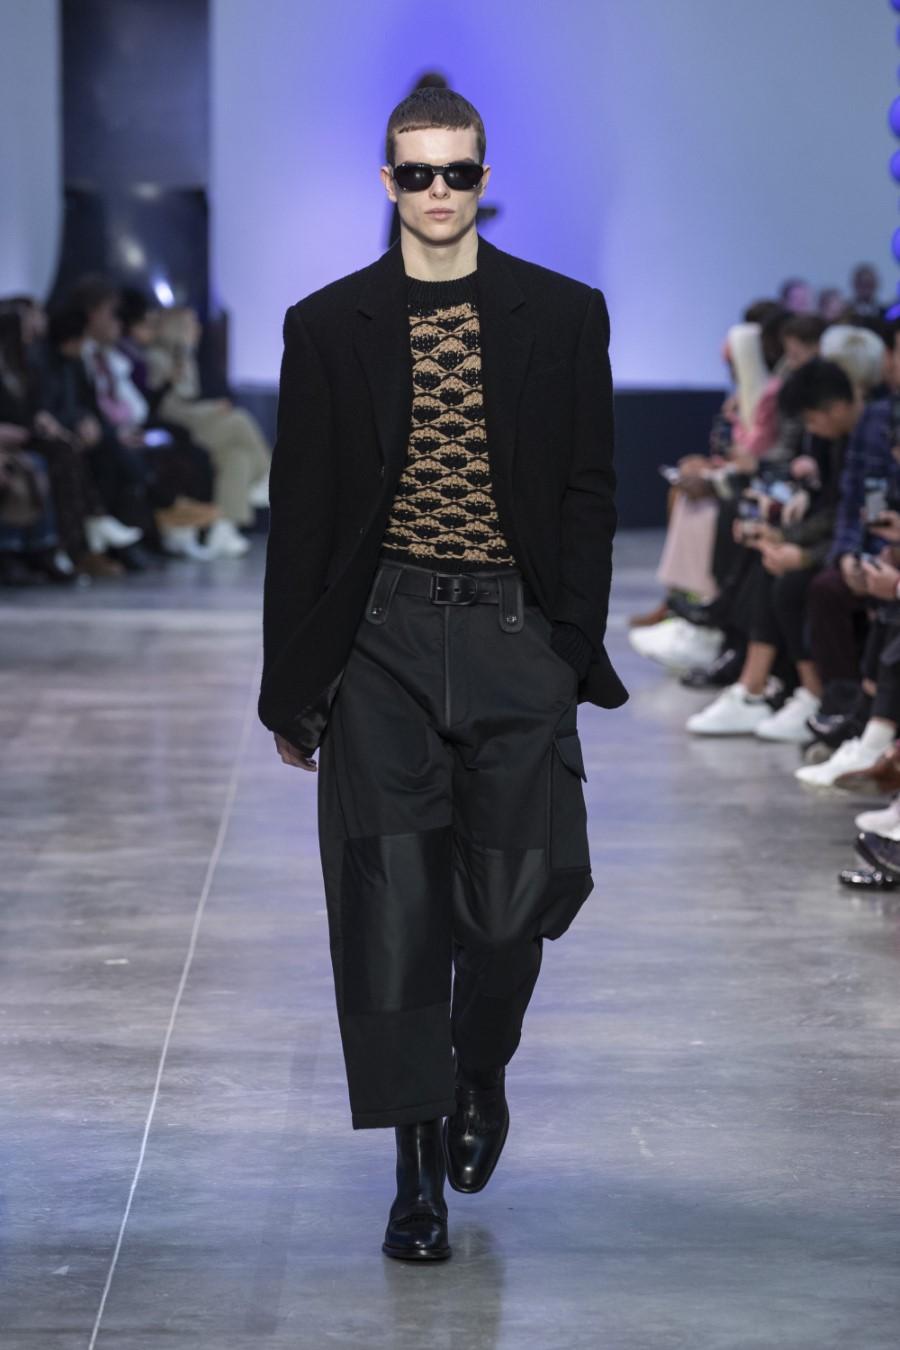 Essential Week Men Paris Cerruti 1881Otoño Invierno Fashion 2019 w8n0OkP